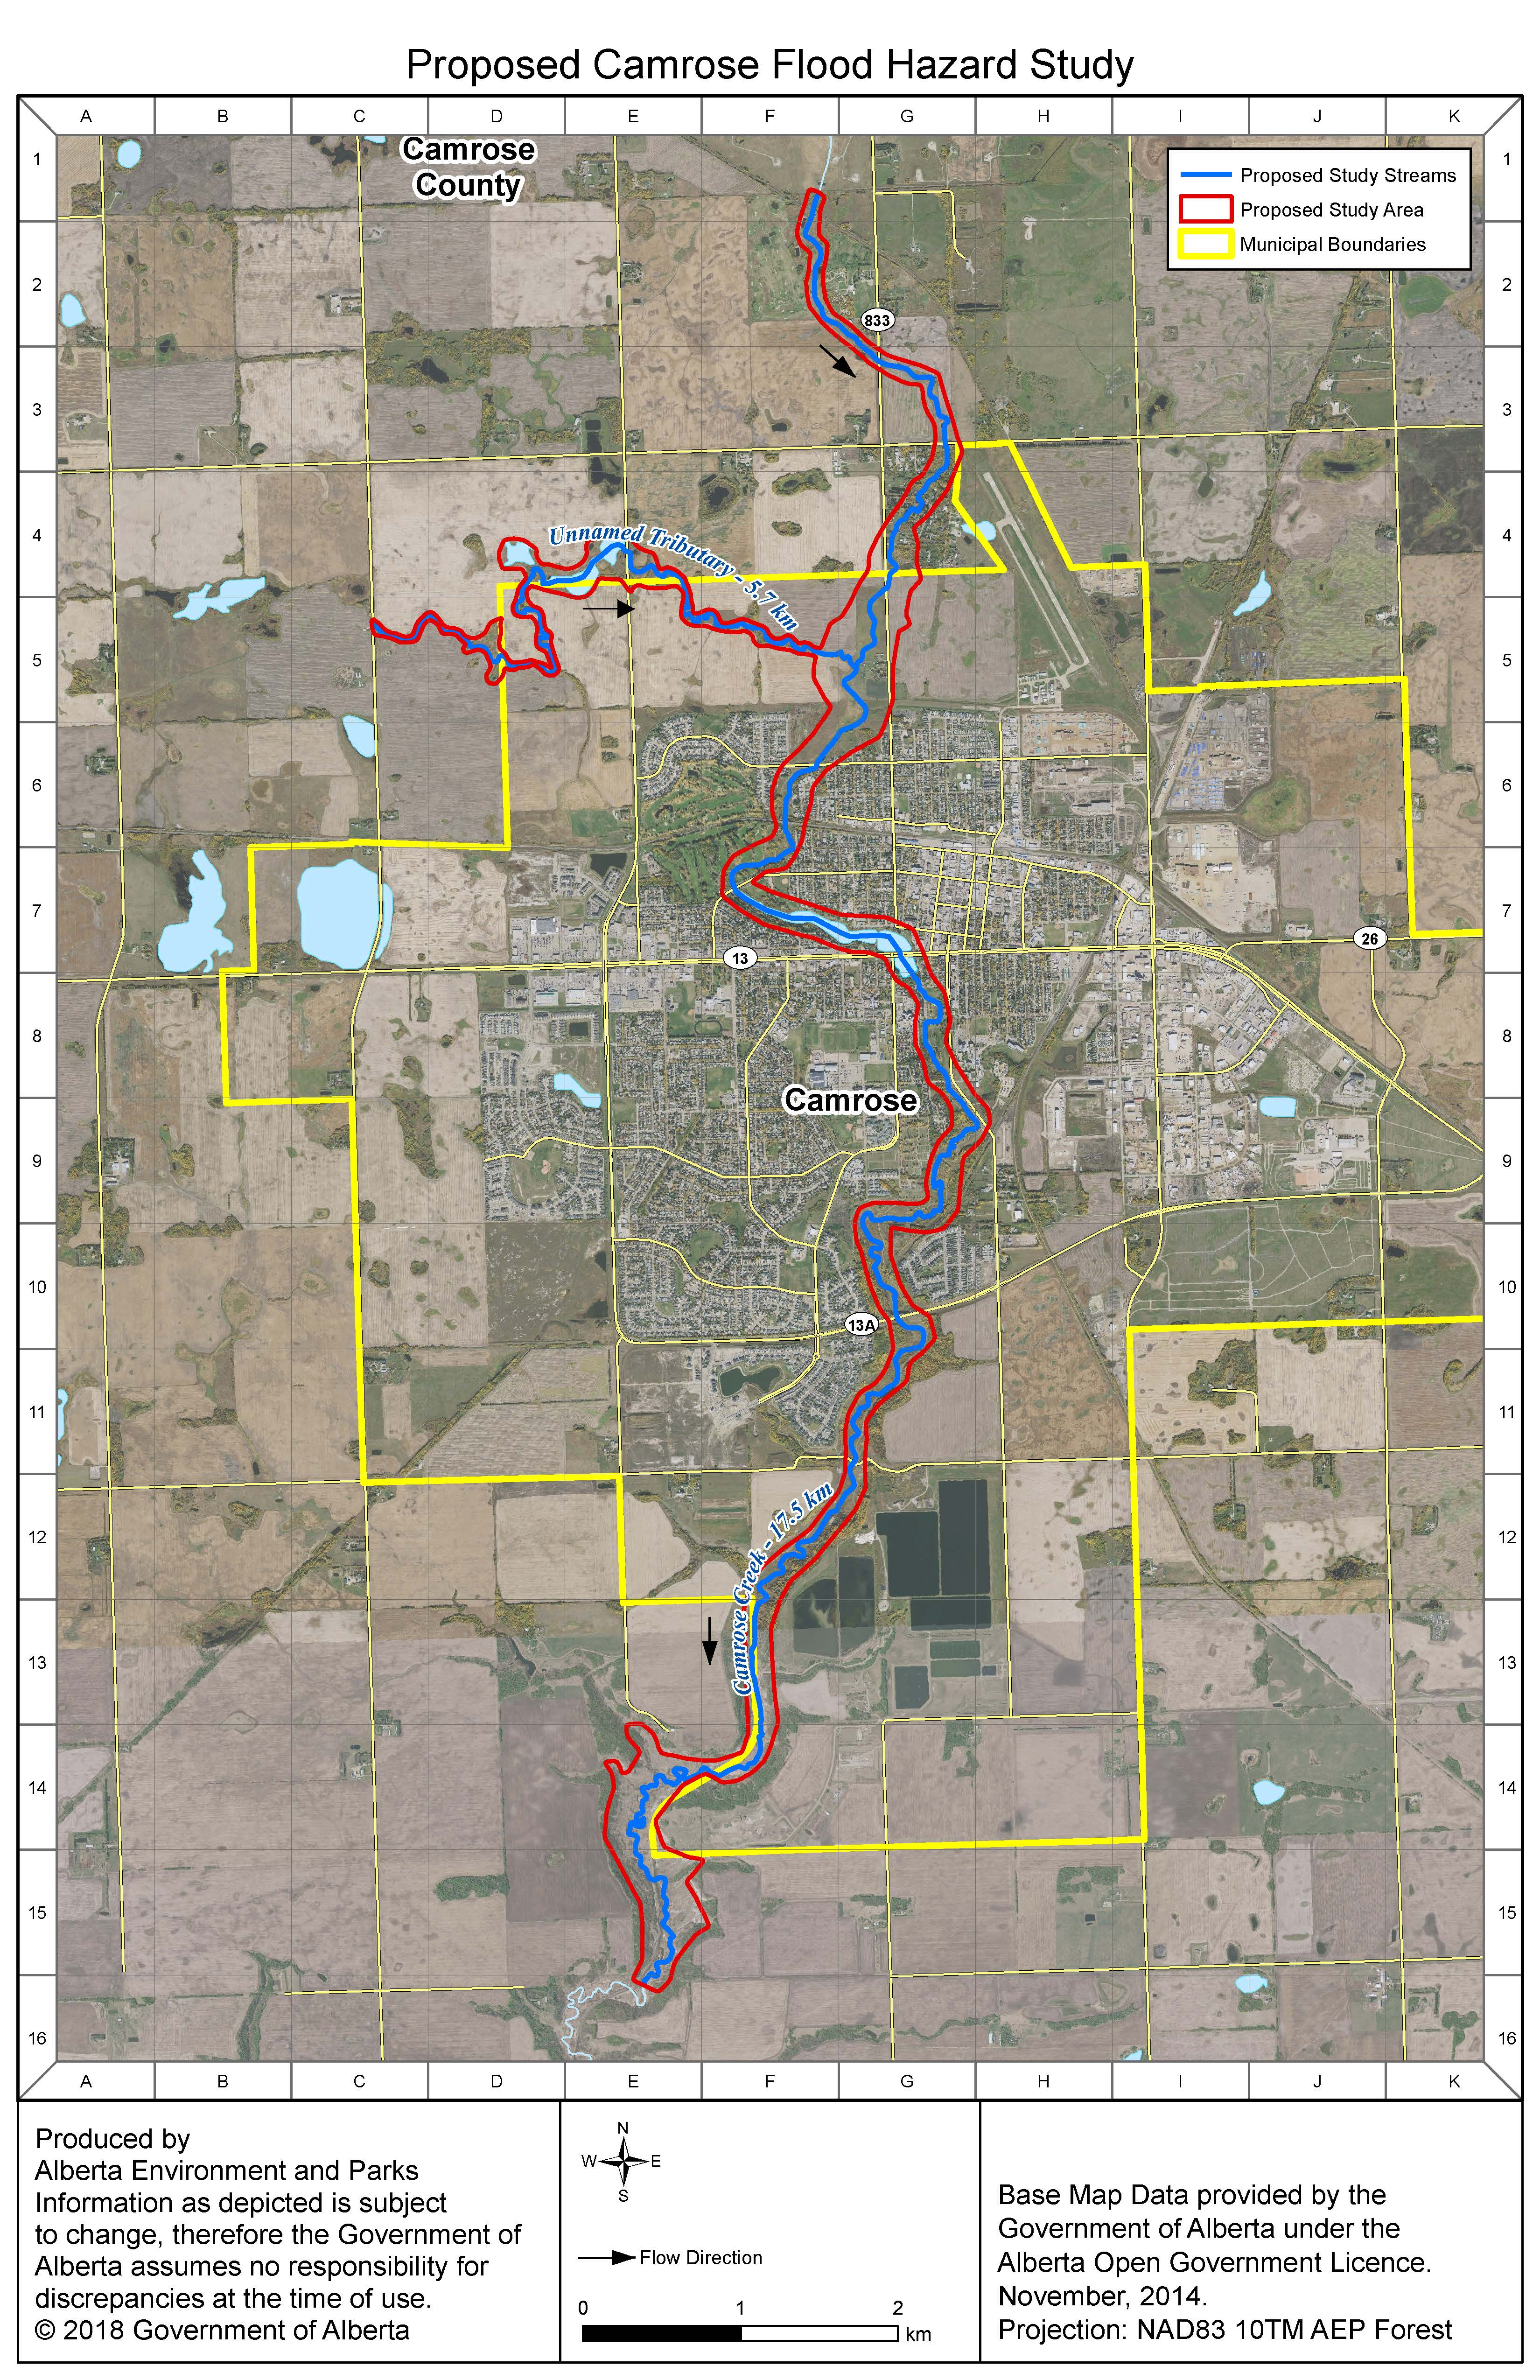 2019-06-21 Camrose Flood study map